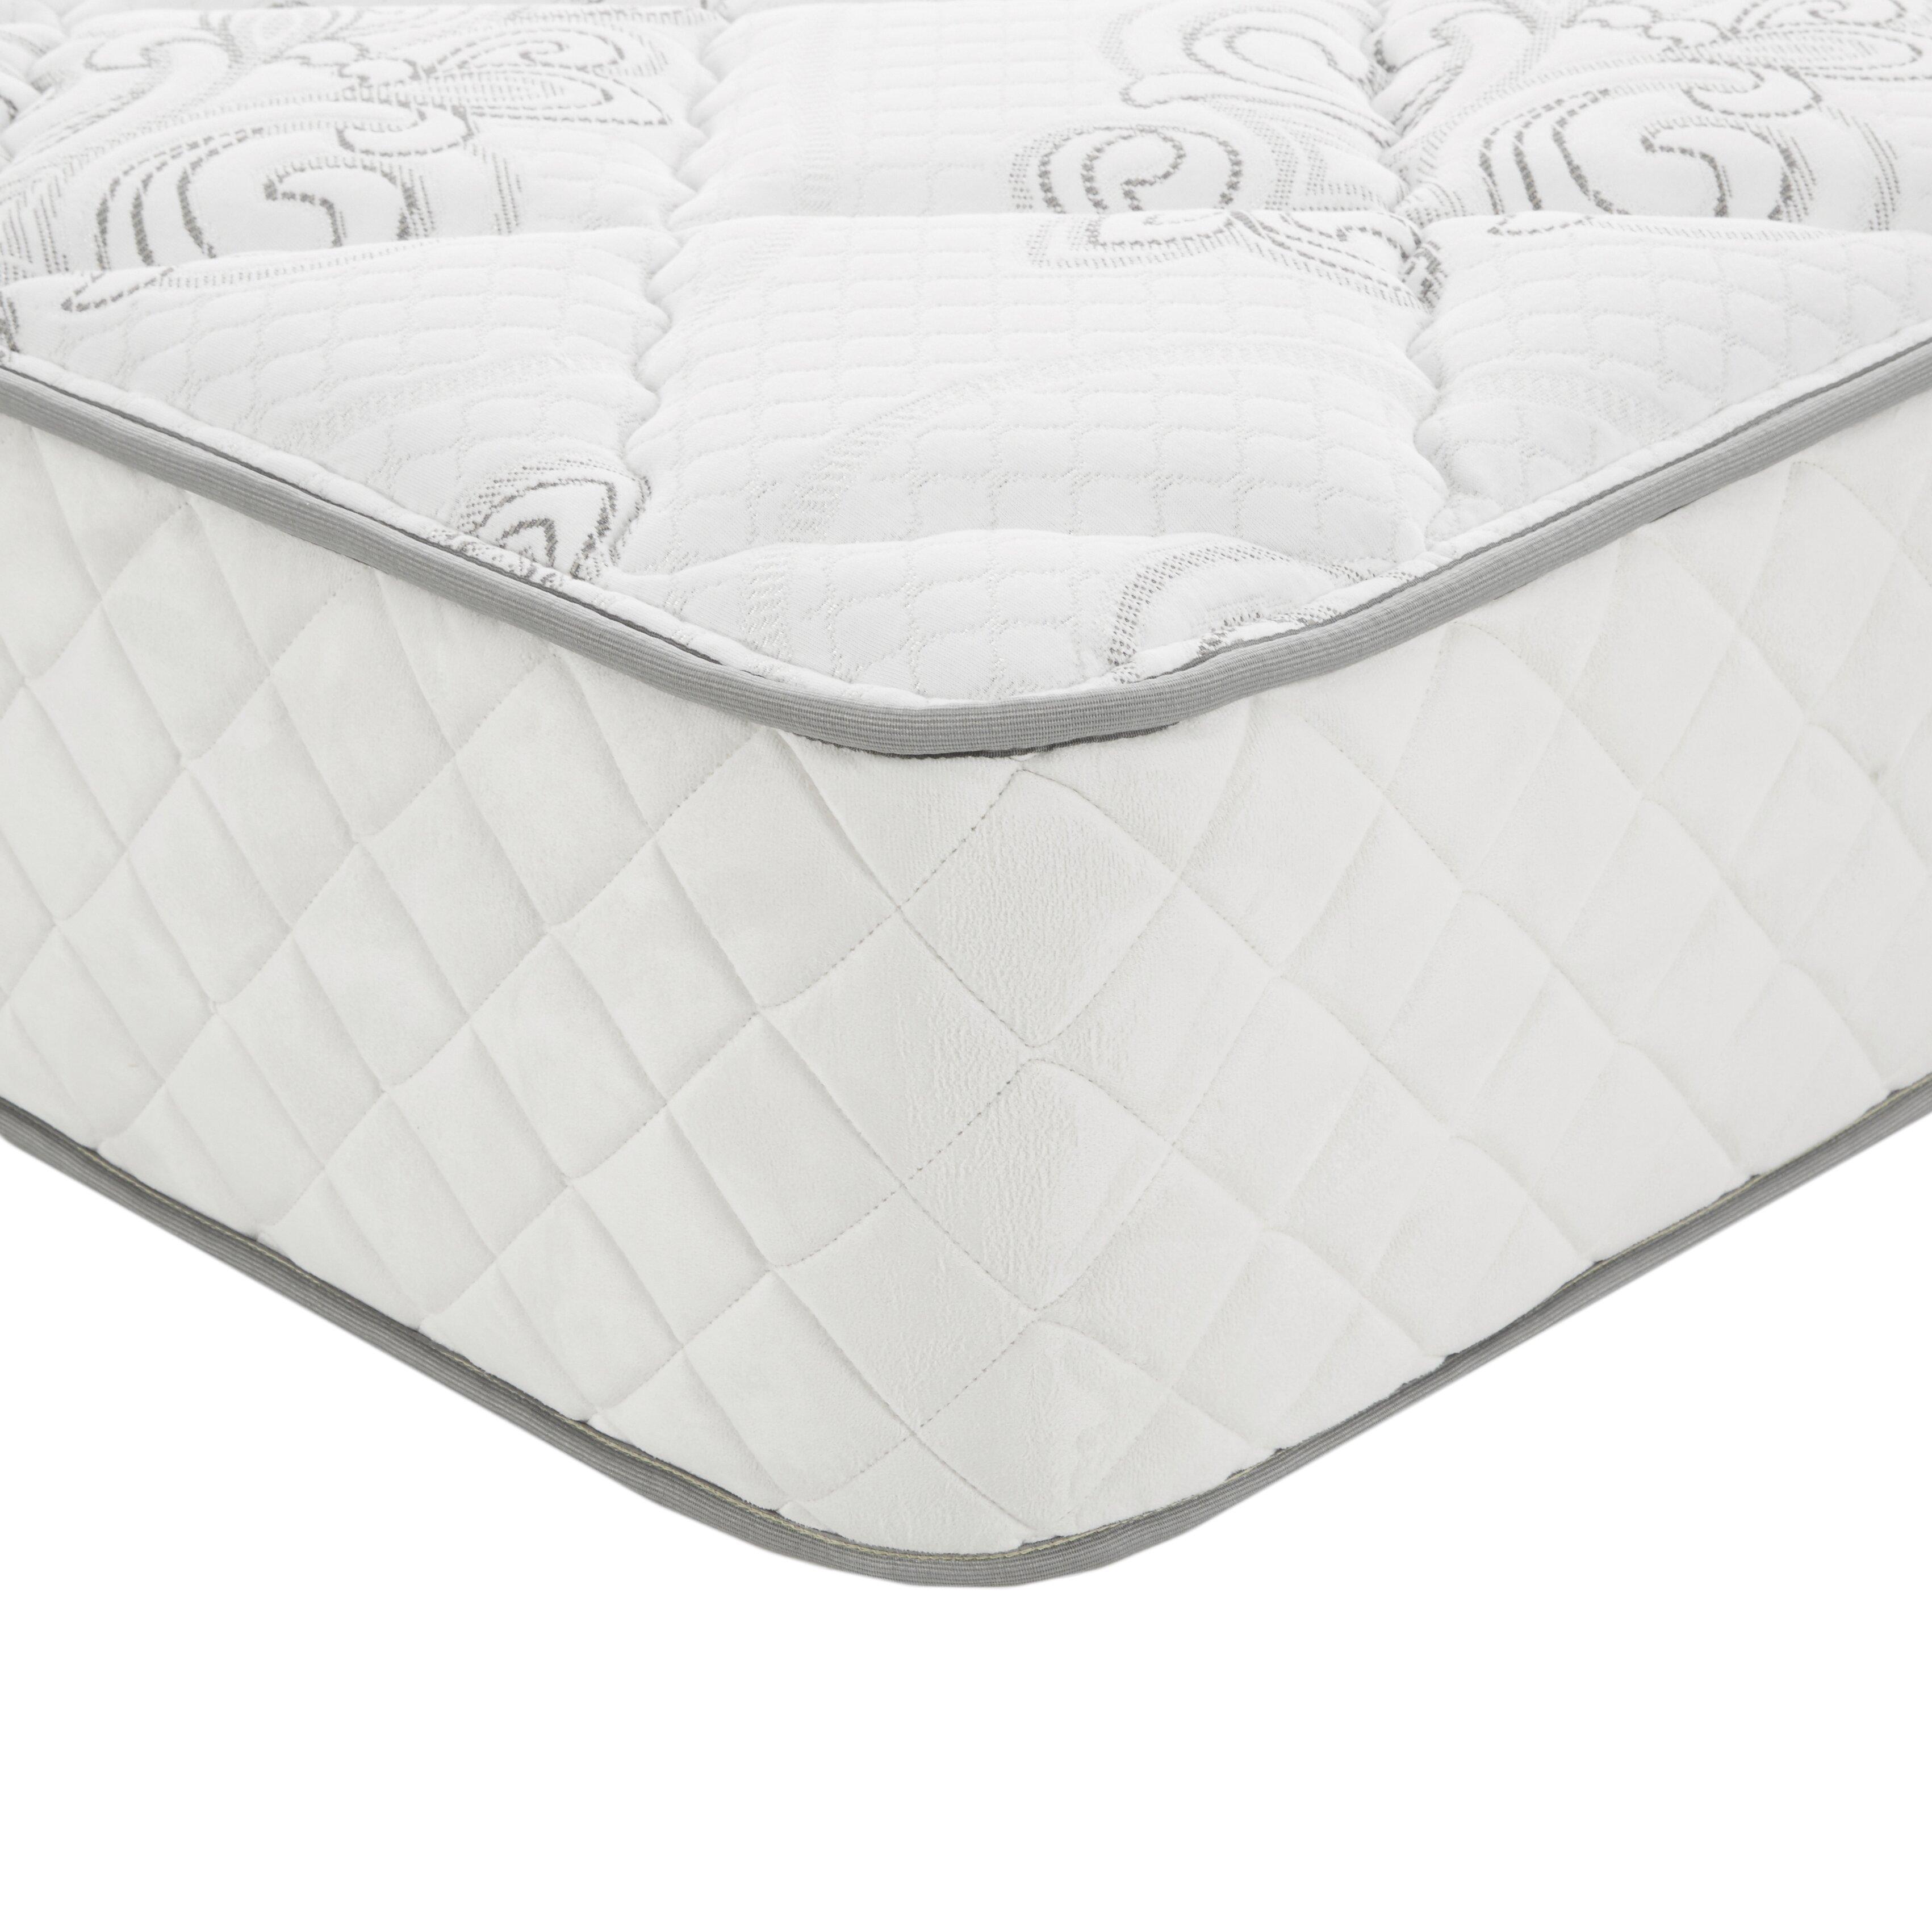 wayfair sleep wayfair sleep 10 firm innerspring mattress reviews wayfair. Black Bedroom Furniture Sets. Home Design Ideas